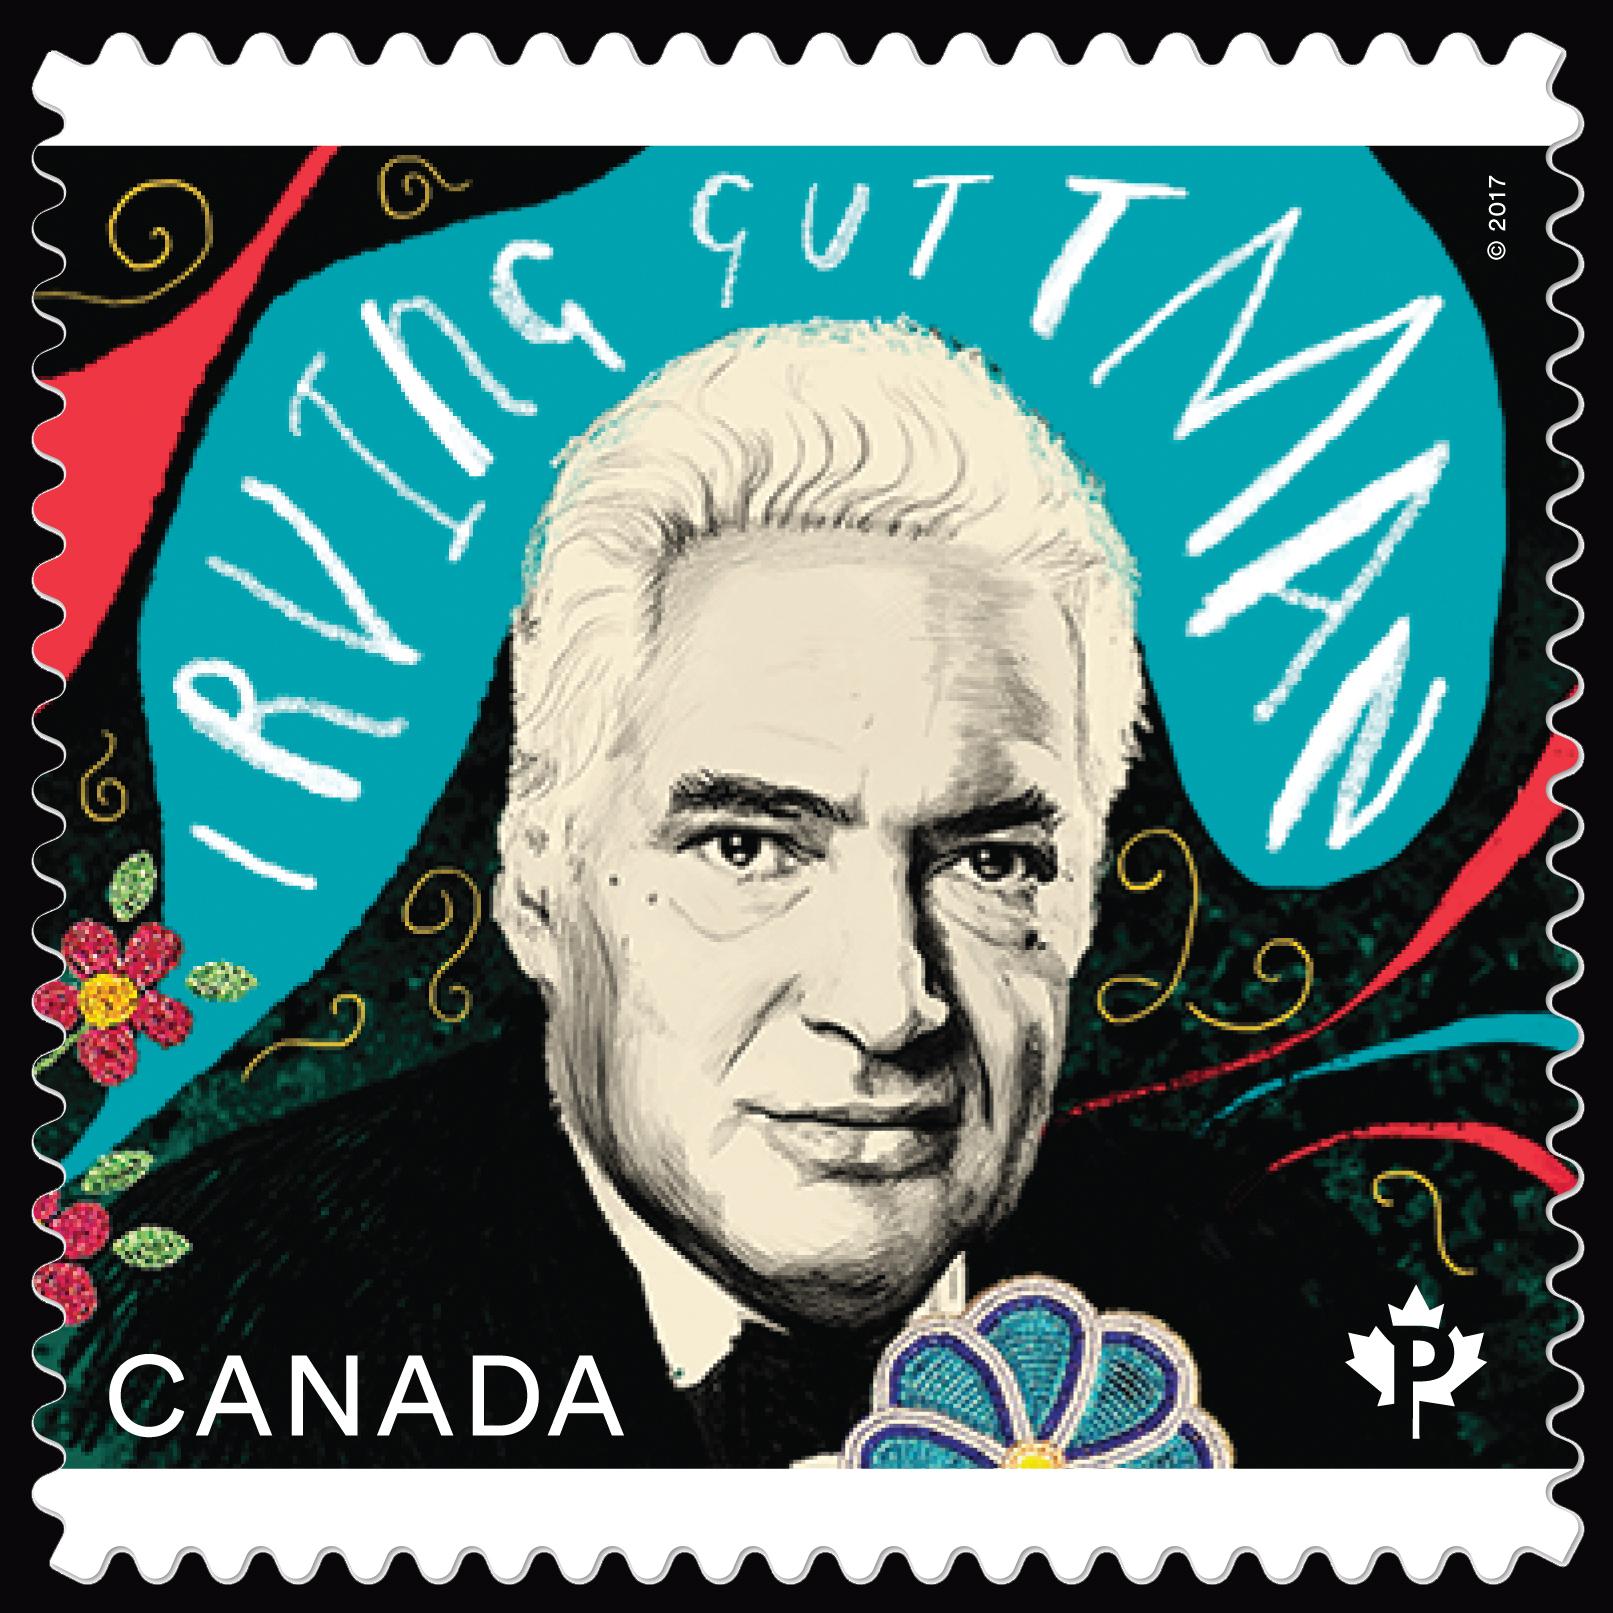 Irving Guttman (Father of Opera) - Canadian Opera Canada Postage Stamp | Canadian Opera